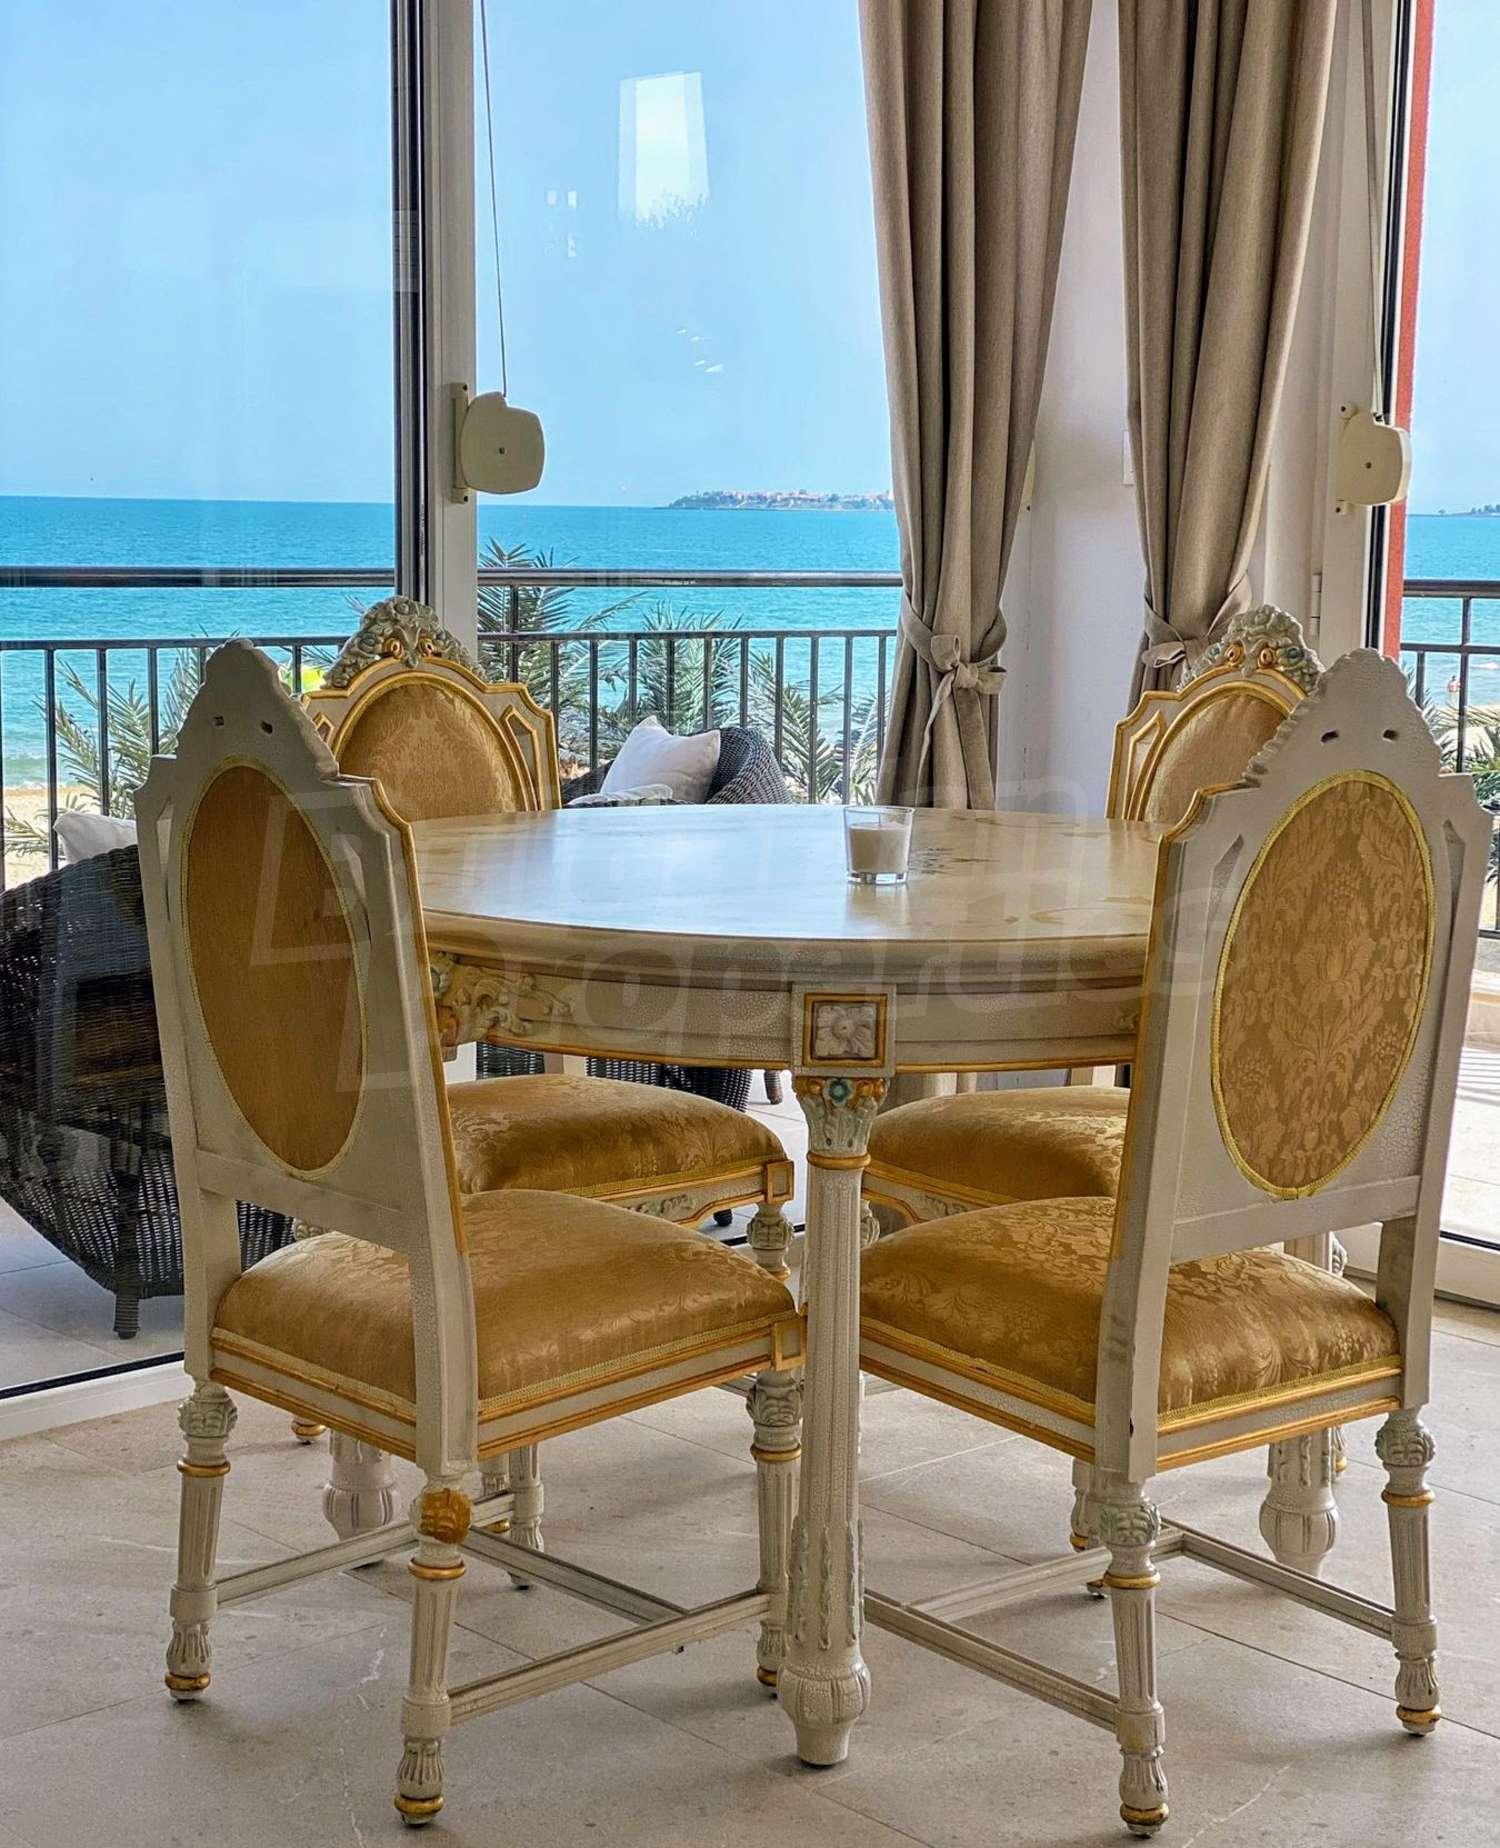 1 Bedroom Apartment For Sale 89 81sq M In Sunny Beach Bulgaria Ref67265 Price 133500 Properties Bg